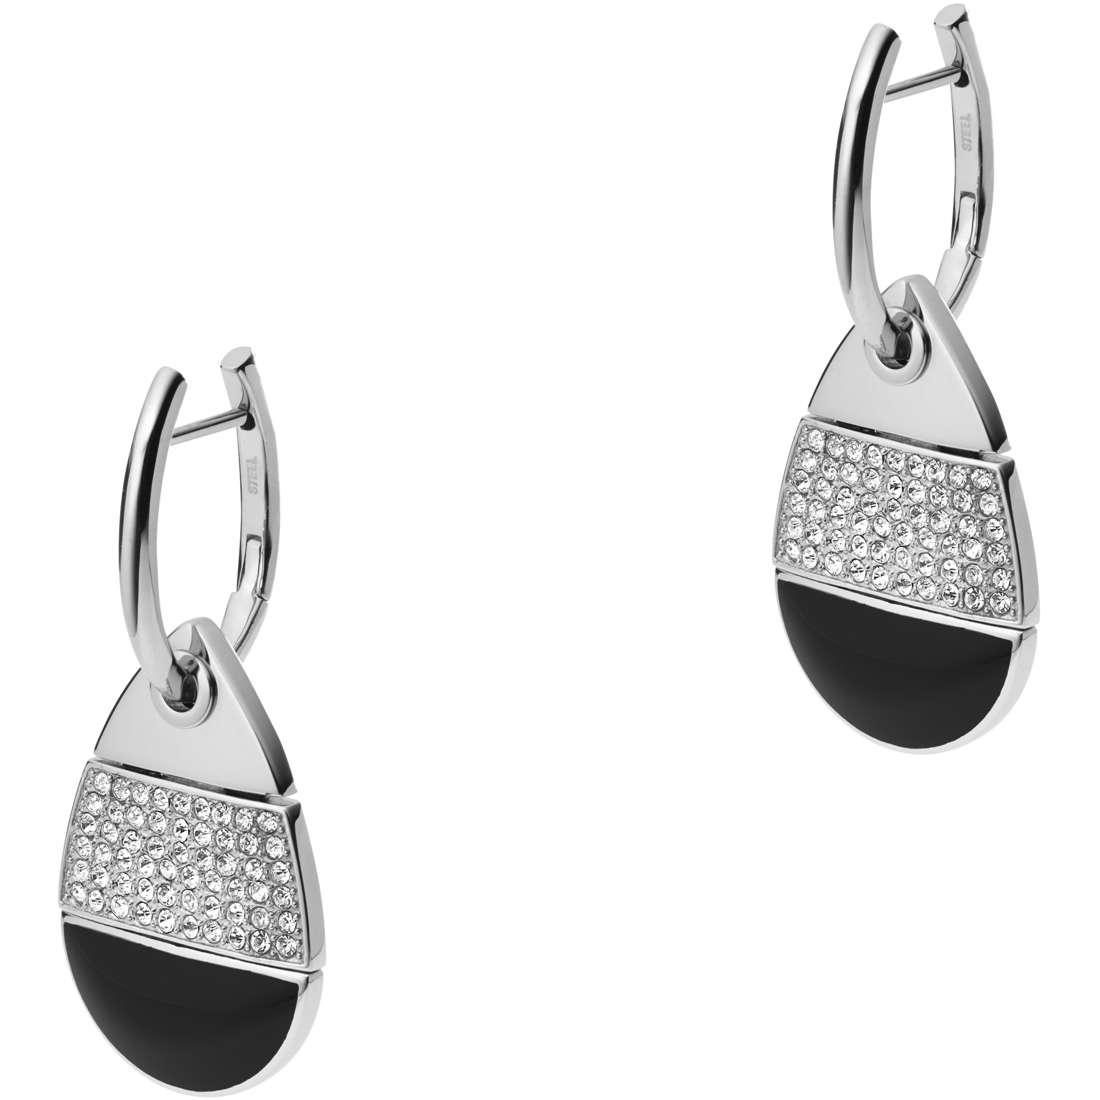 boucles d'oreille femme bijoux Emporio Armani Fall 2013 EGS1774040